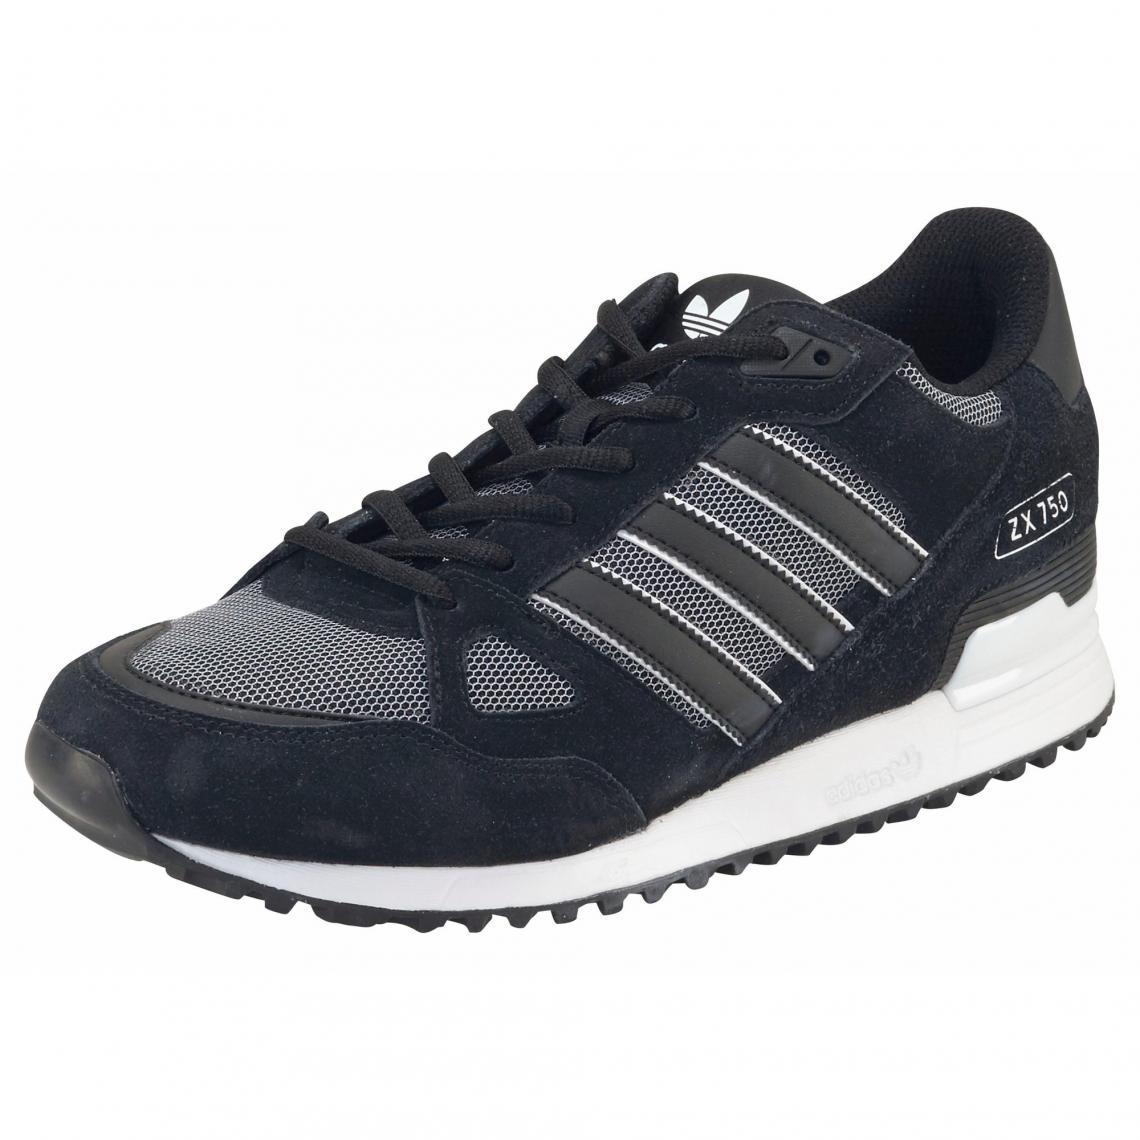 adidas zx 750 enfant garcon